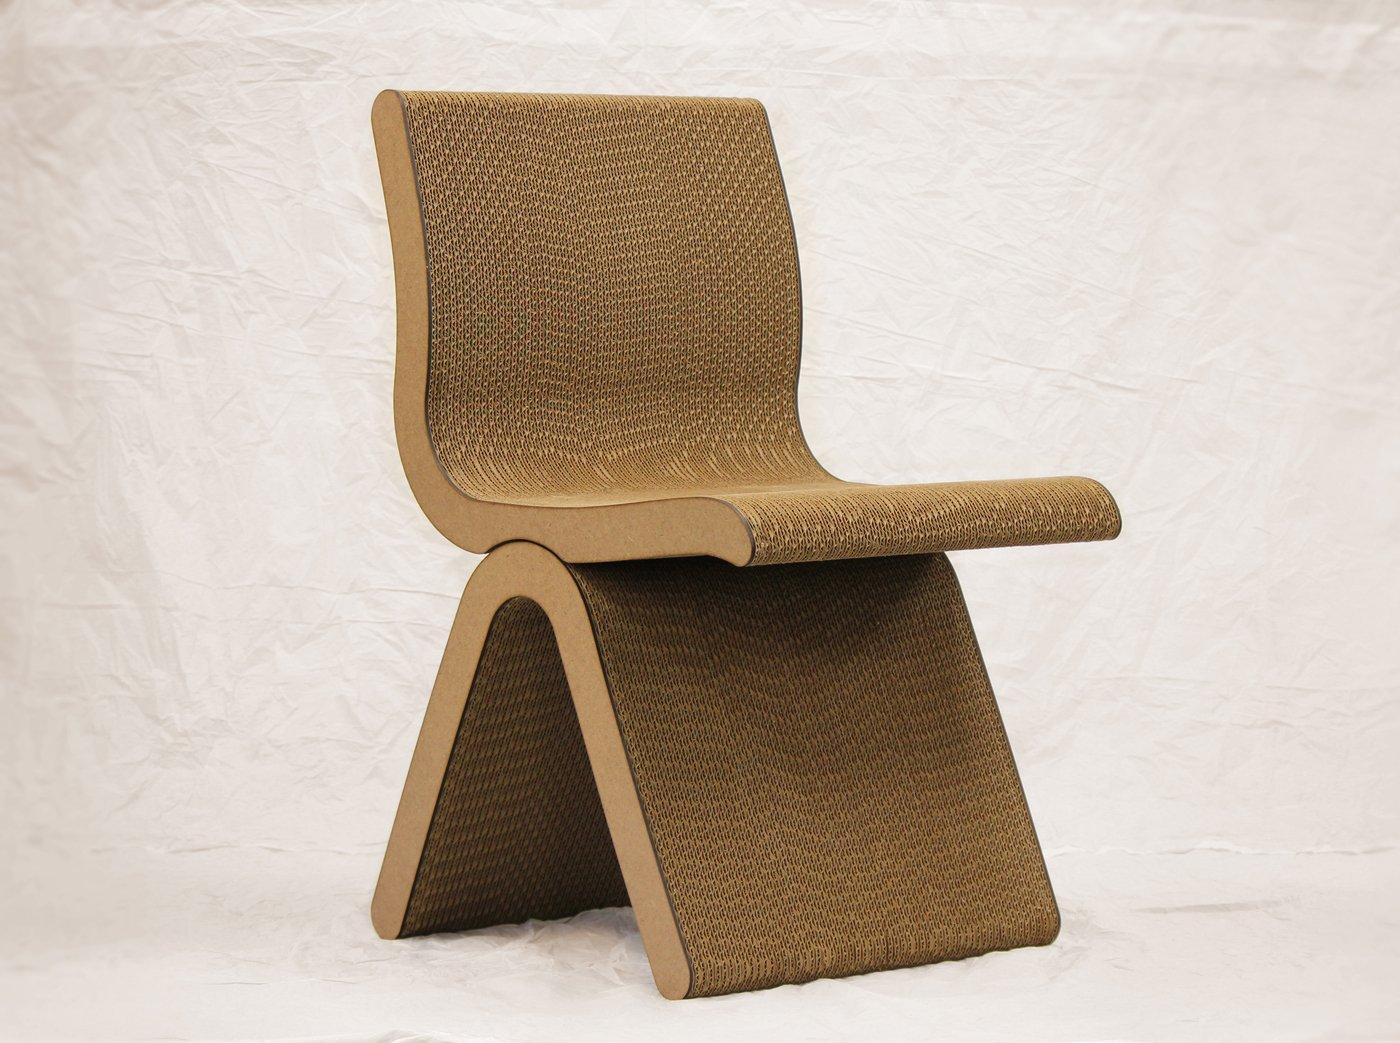 Cardboard furniture chair - Cardboard Furniture Chair 2